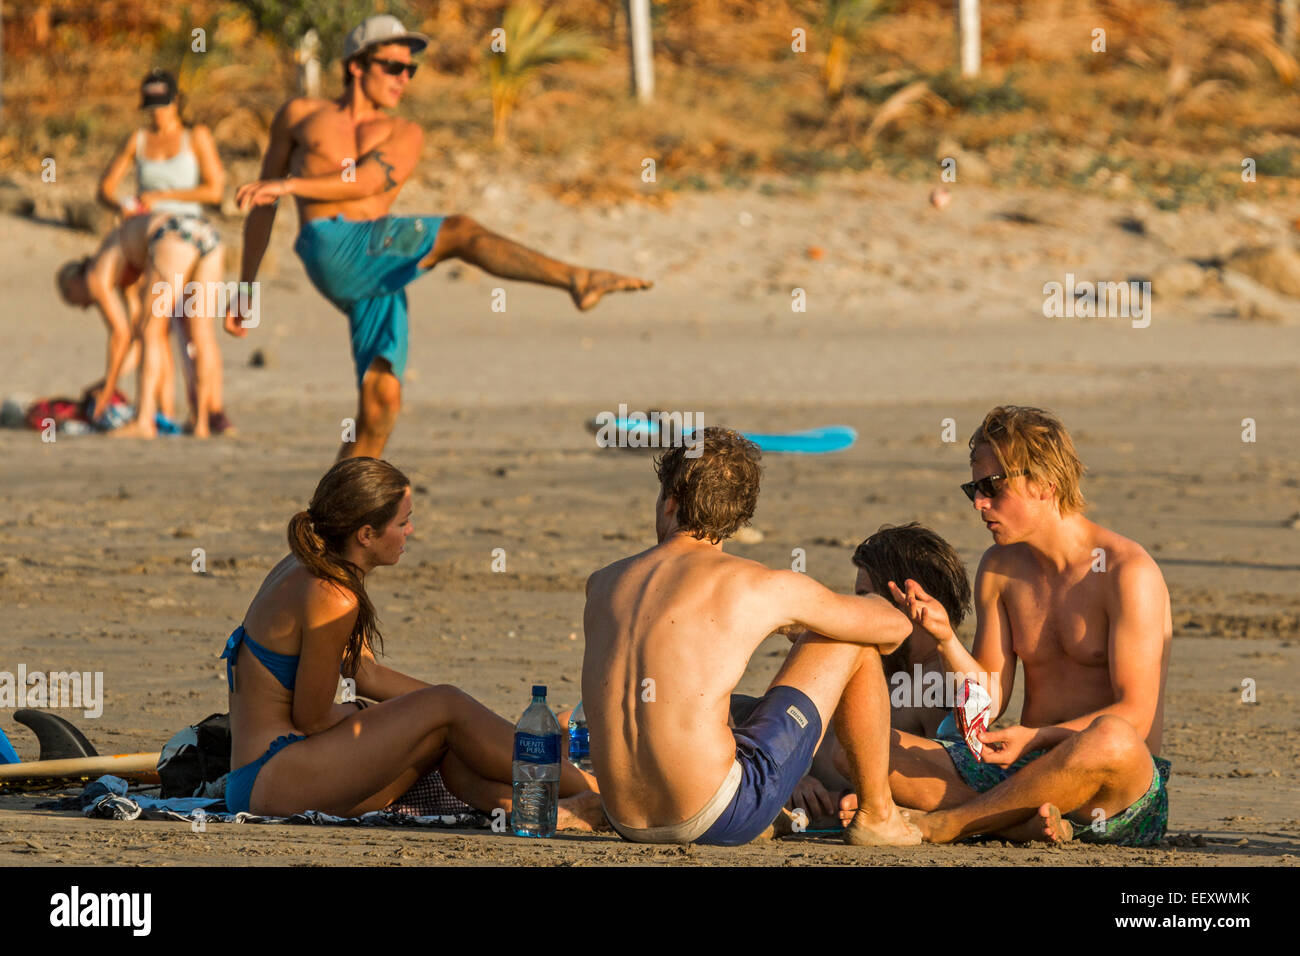 Lively scene at this young surf vibe beach near tourist hub San Juan del Sur; Playa Maderas, San Juan del Sur, Rivas, - Stock Image